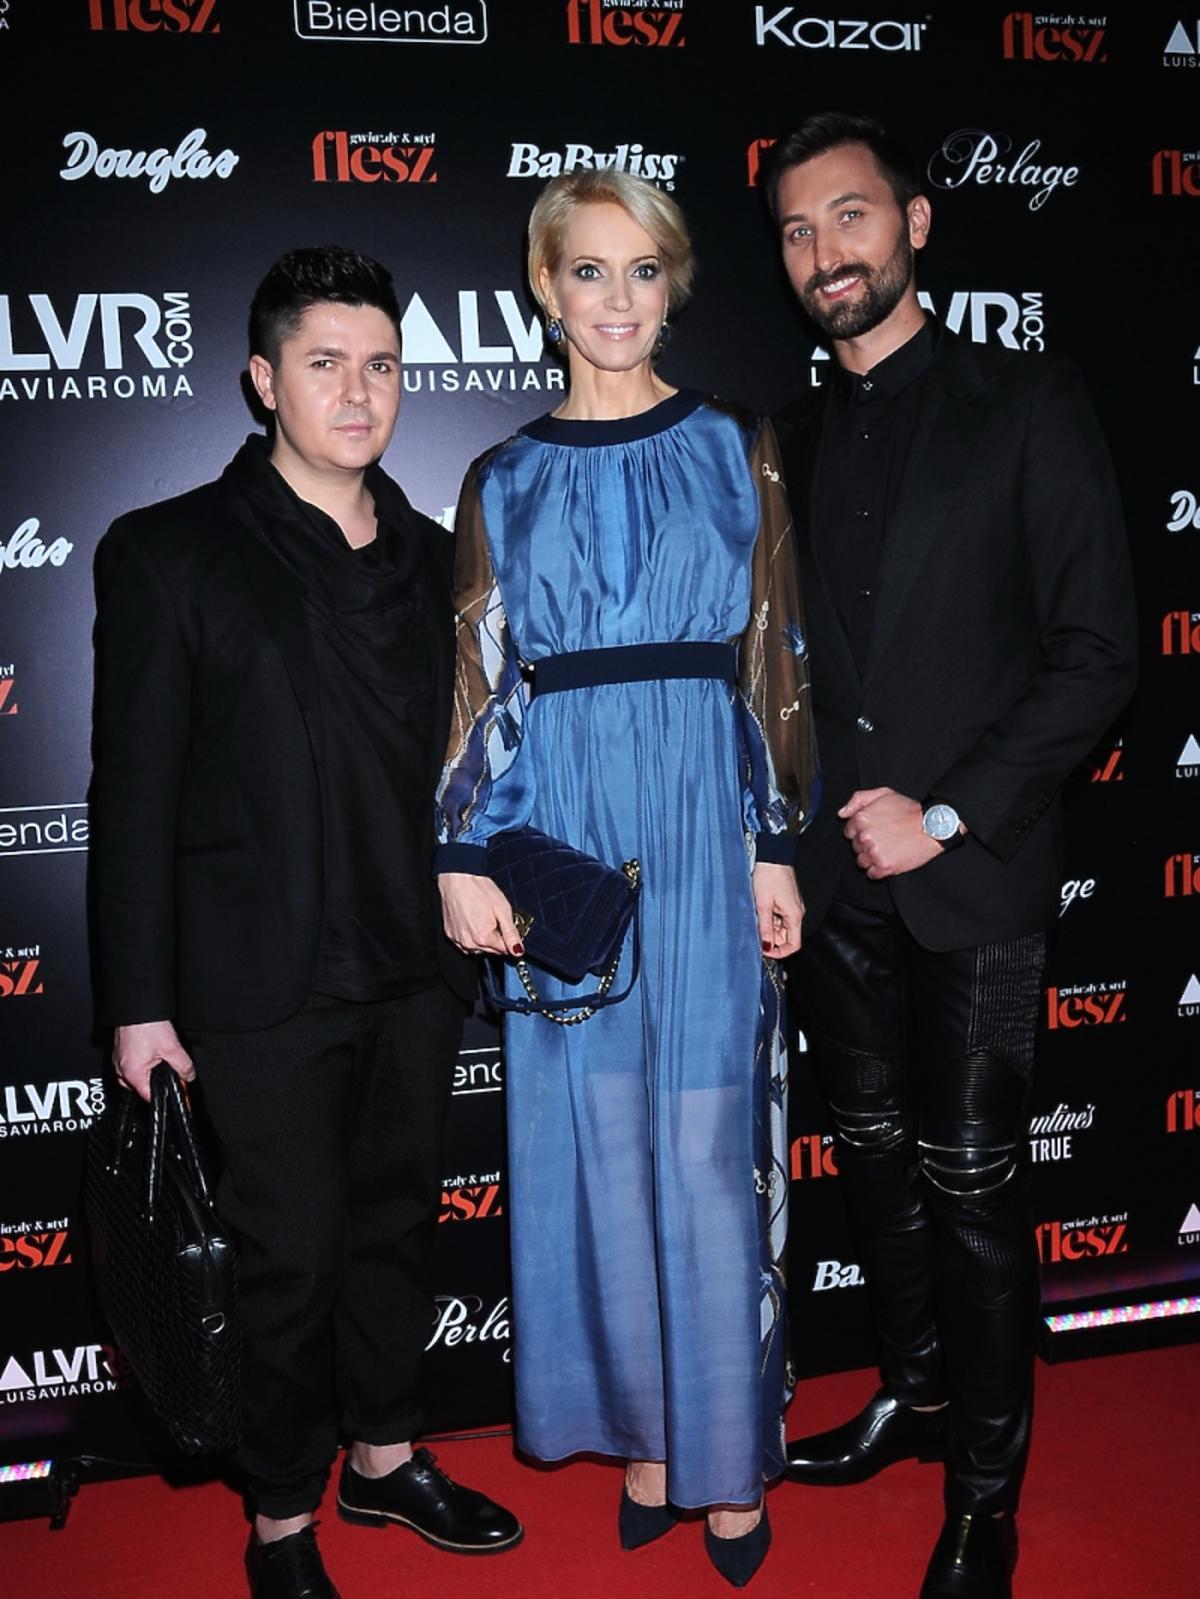 Paulina Smaszcz Kurzajewska na gali Flesz Fashion Night